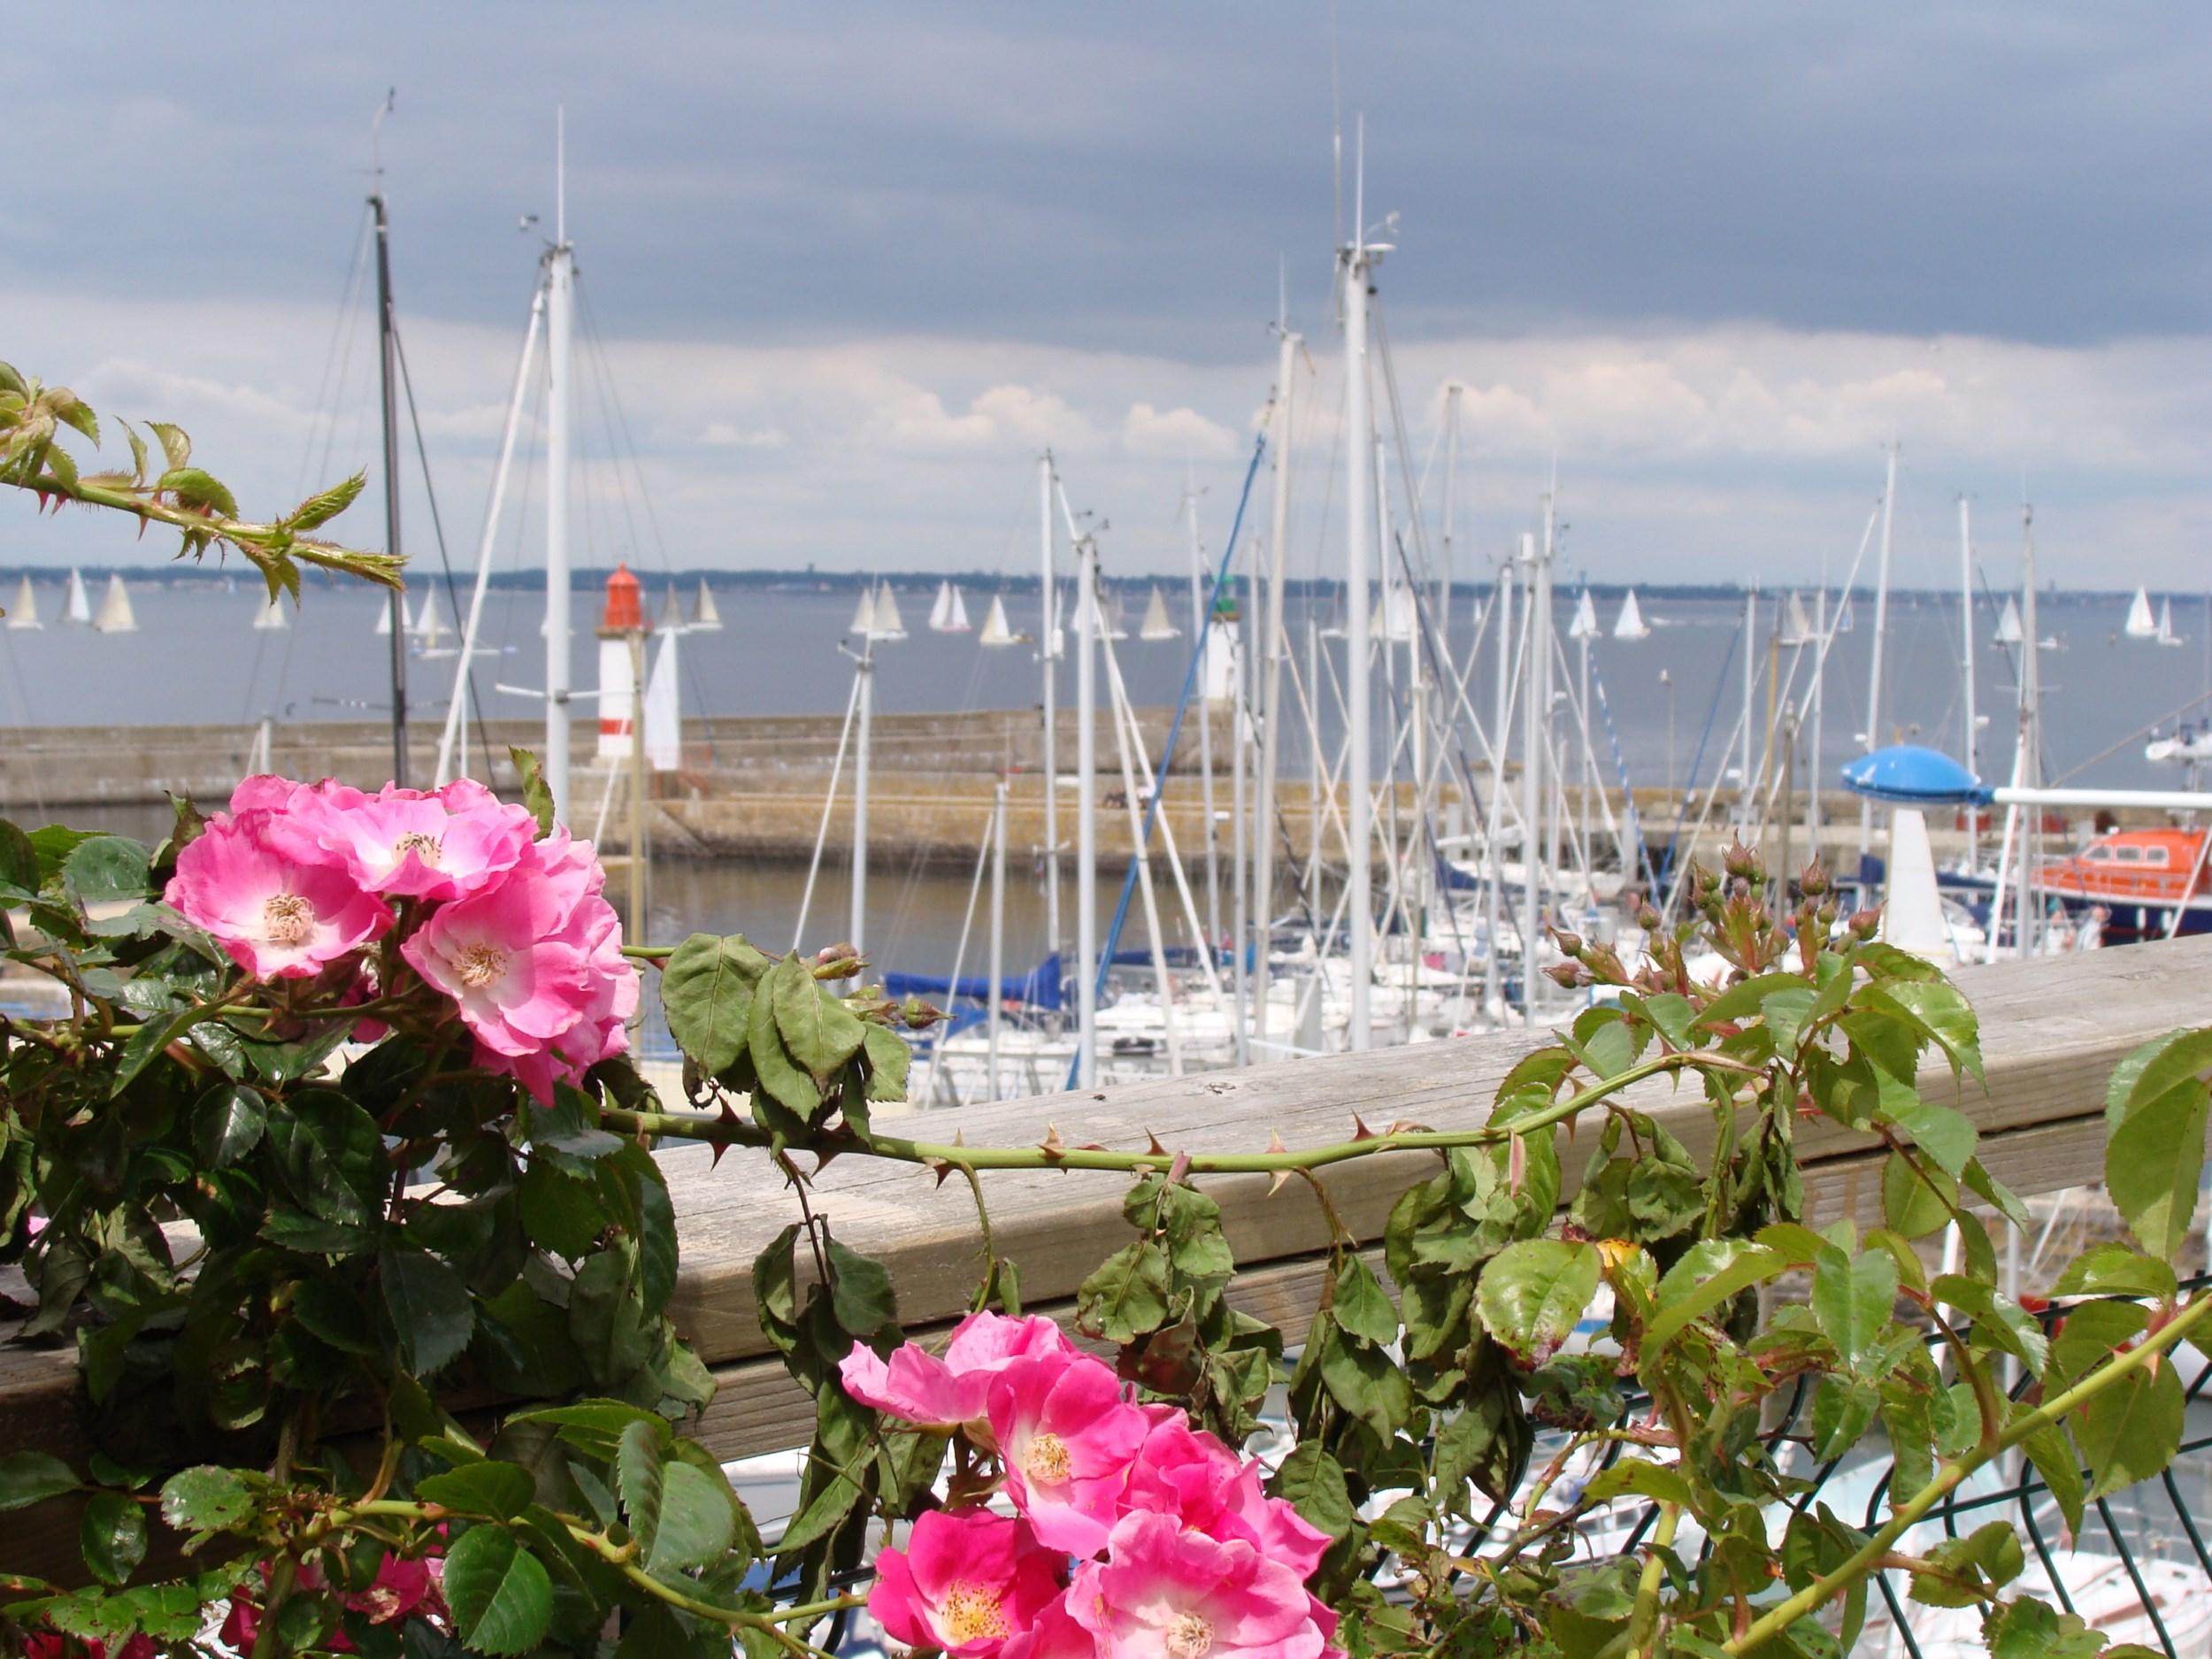 yourte Morbihan;roulotte bretagne;tipibretagnesud;cabane morbihan;Groix-7320